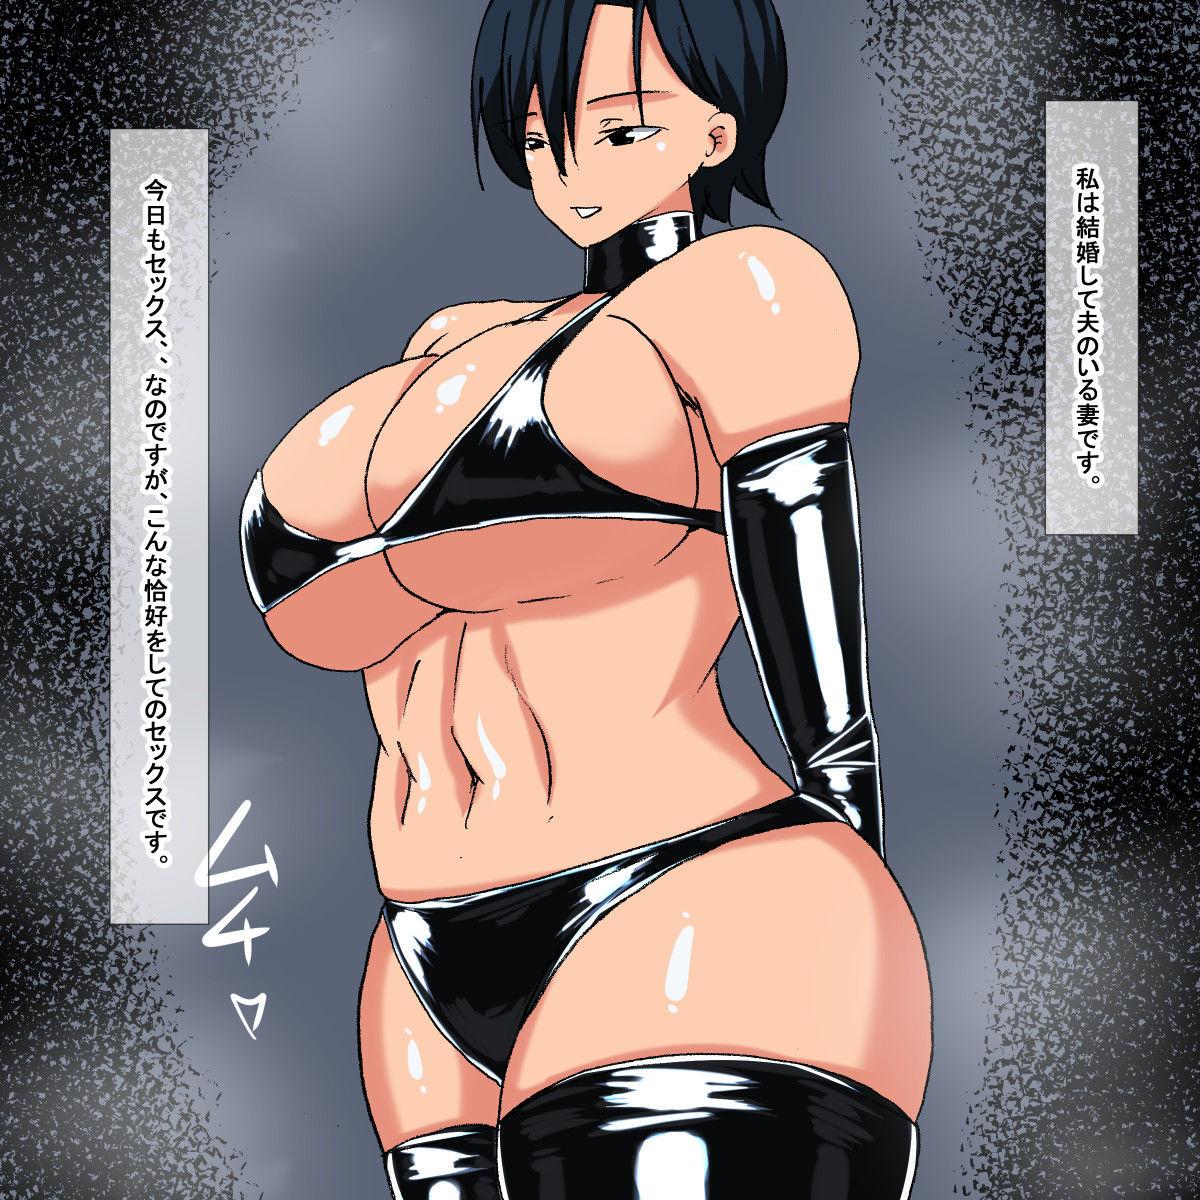 ns ビキニ風ボディスーツ妻 エロ画像